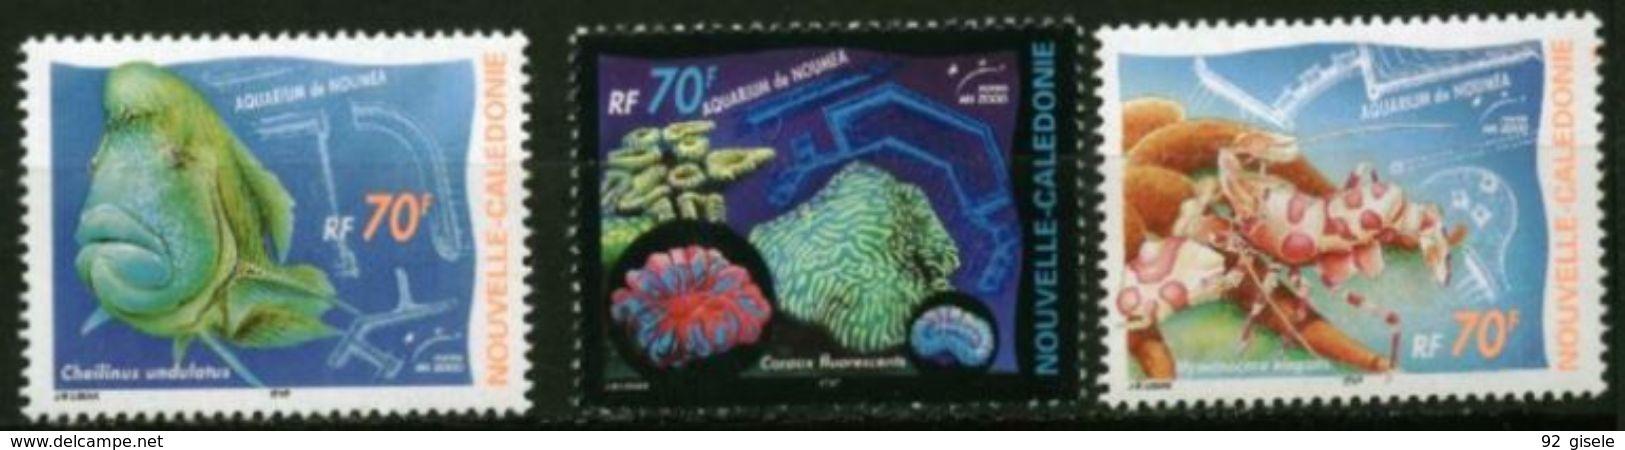 "Nle-Caledonie YT 815 à 817 "" Aquarium Nouméa "" 2000 Neuf** - Nuova Caledonia"